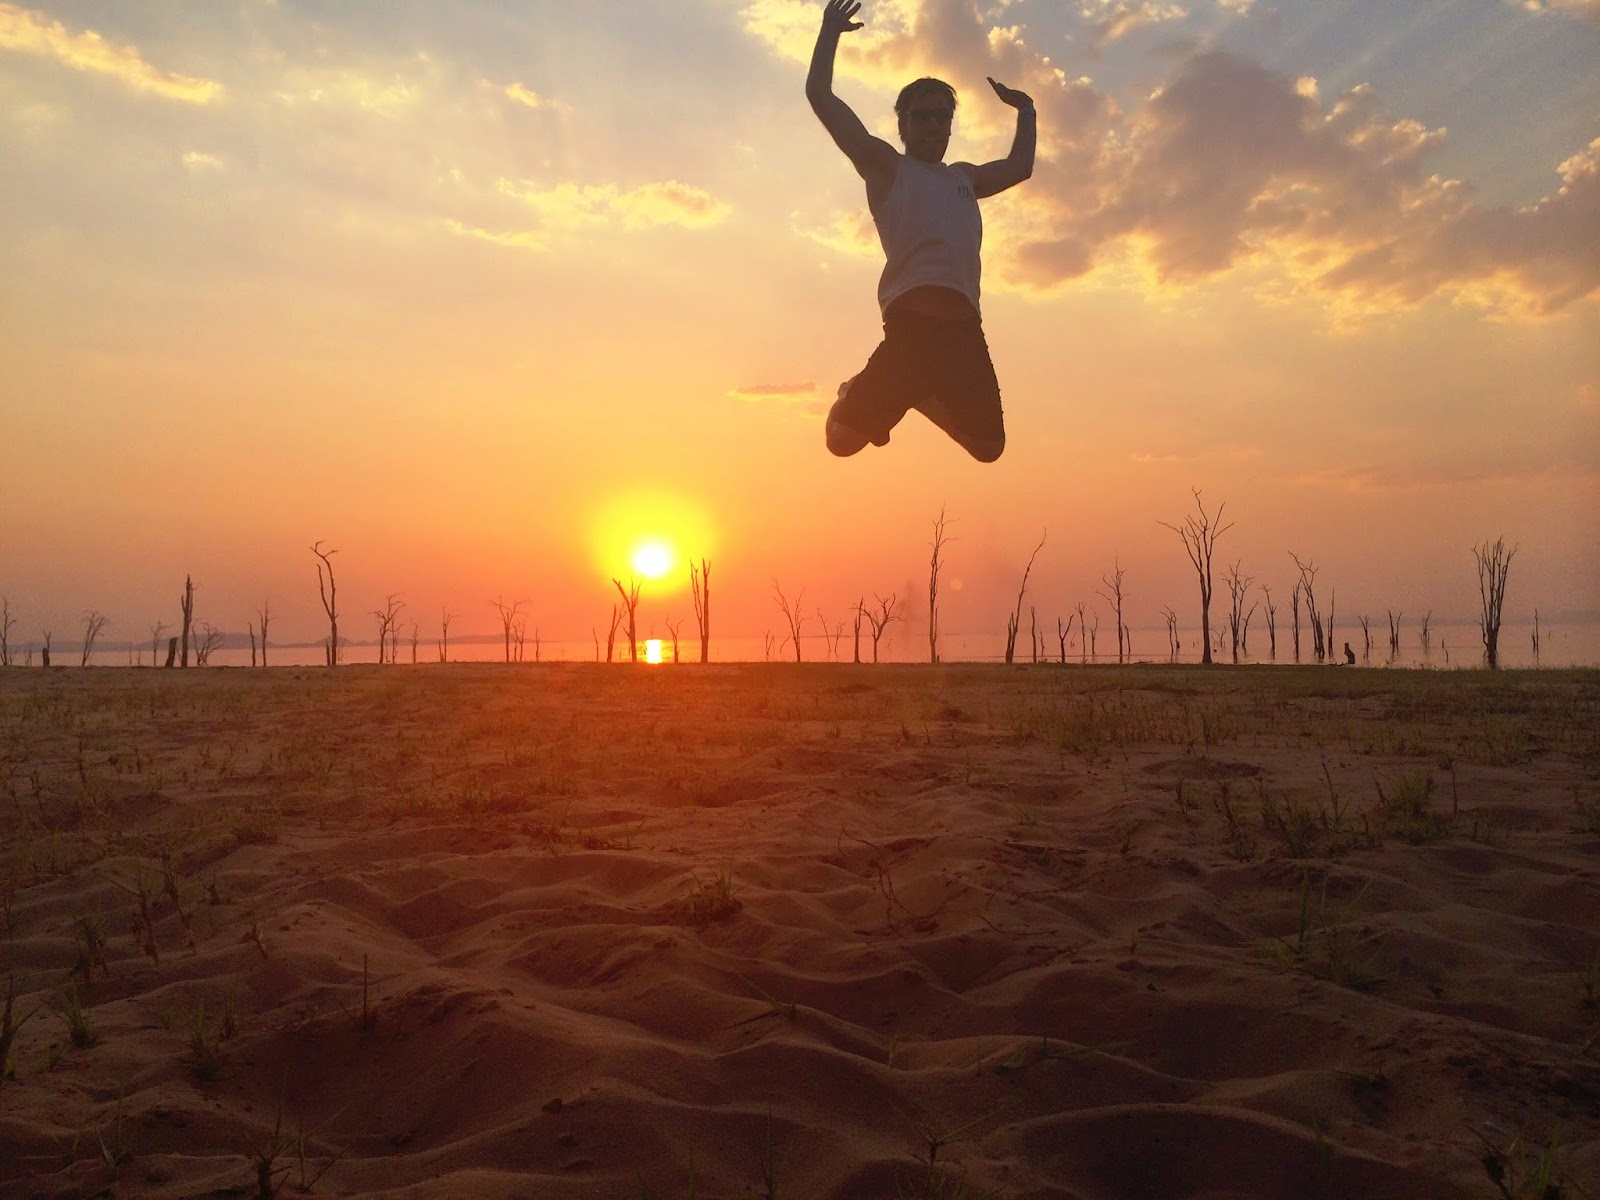 Jumping into the sun - sunset at Rhino Safari Camp